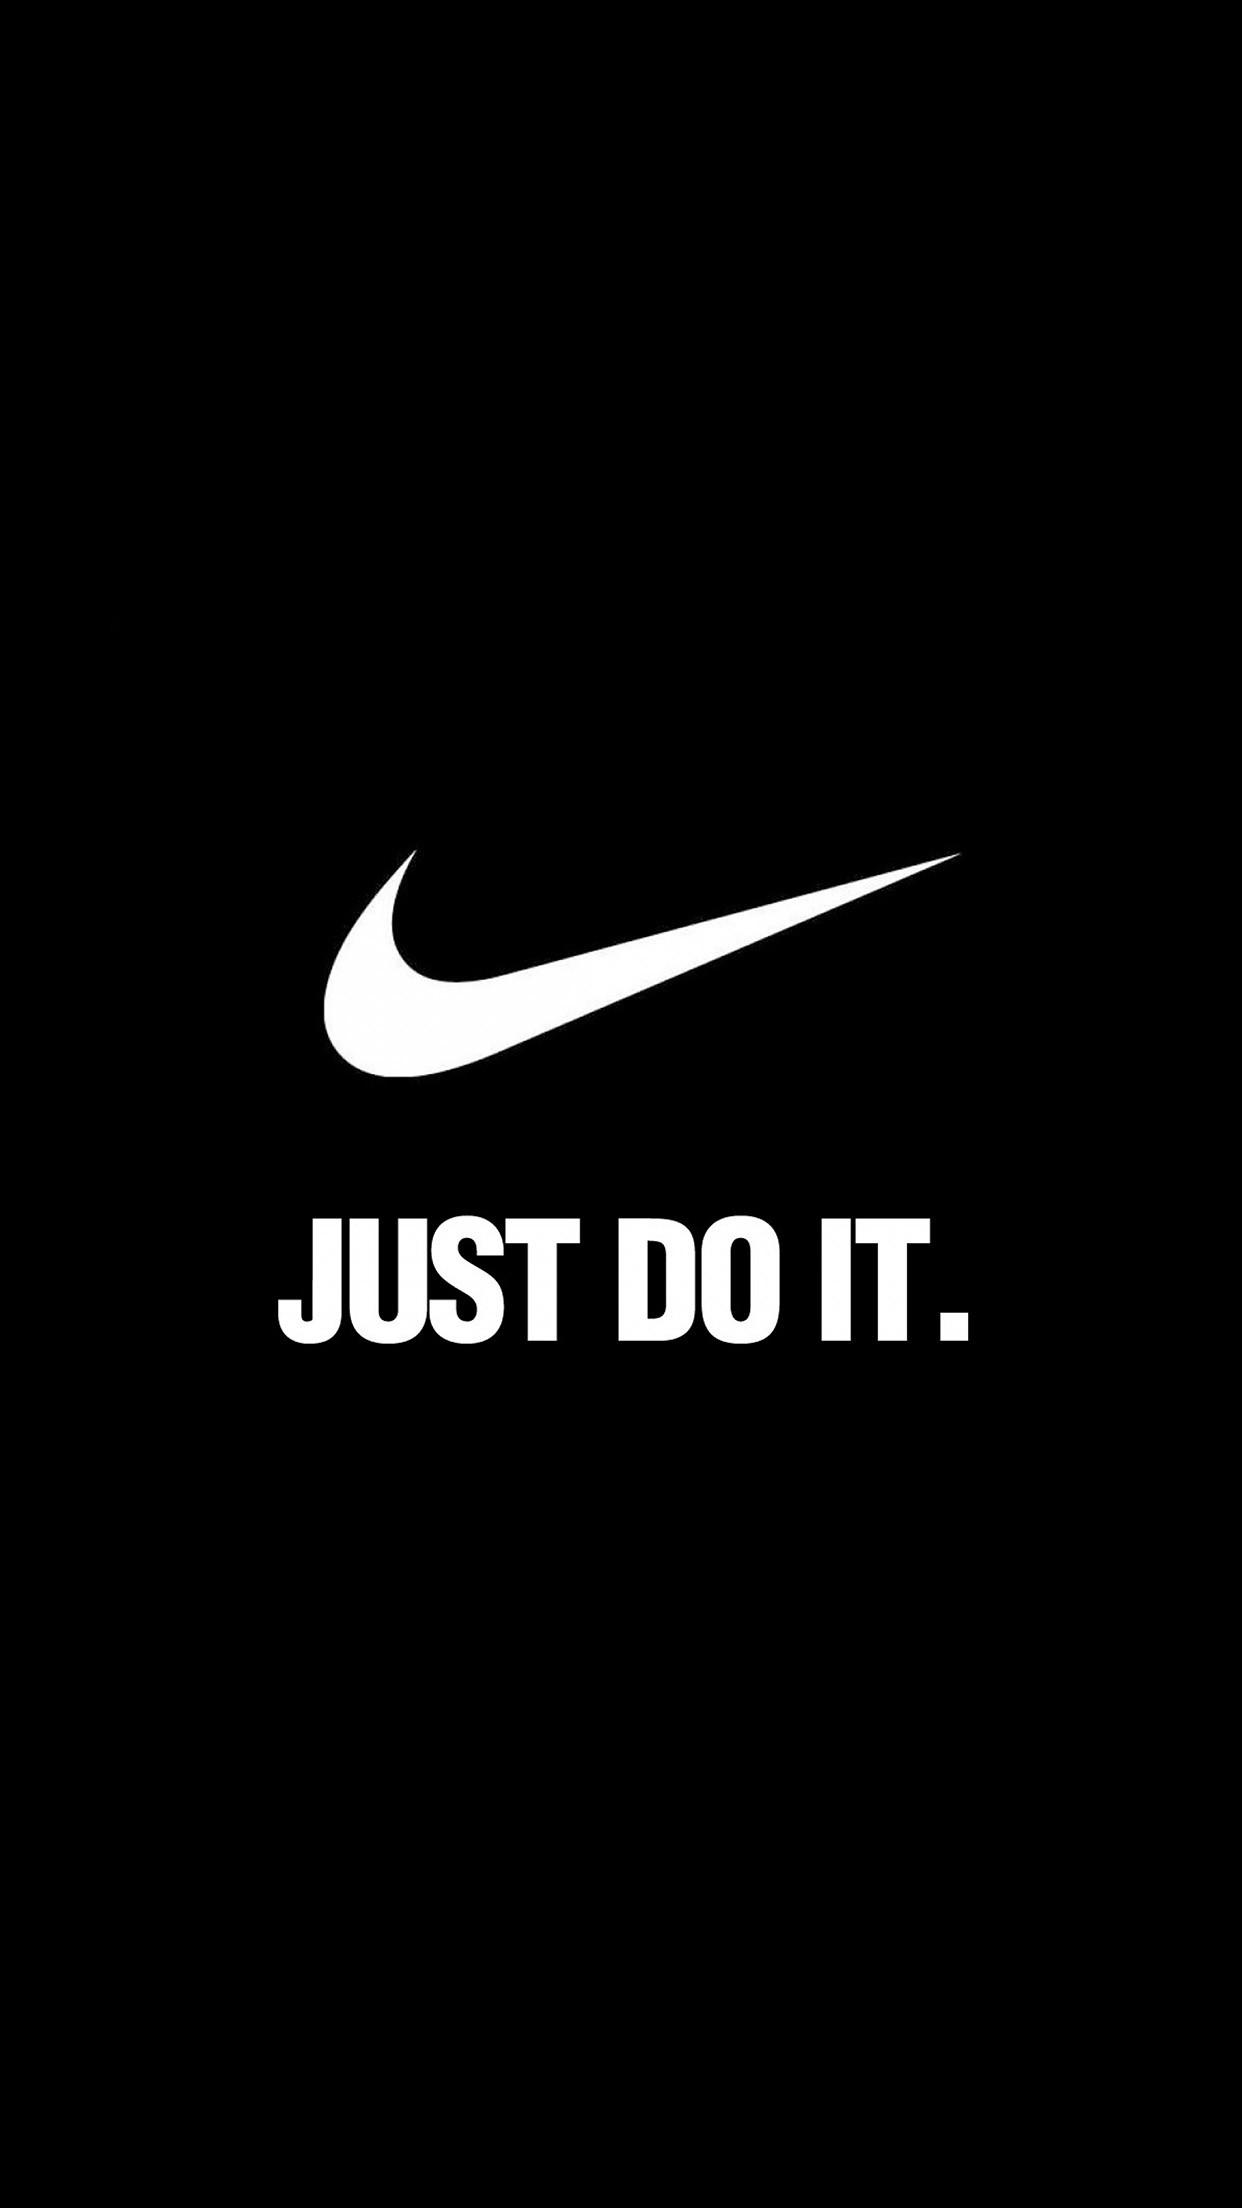 Logo Nike Brand Just Do It Motivation